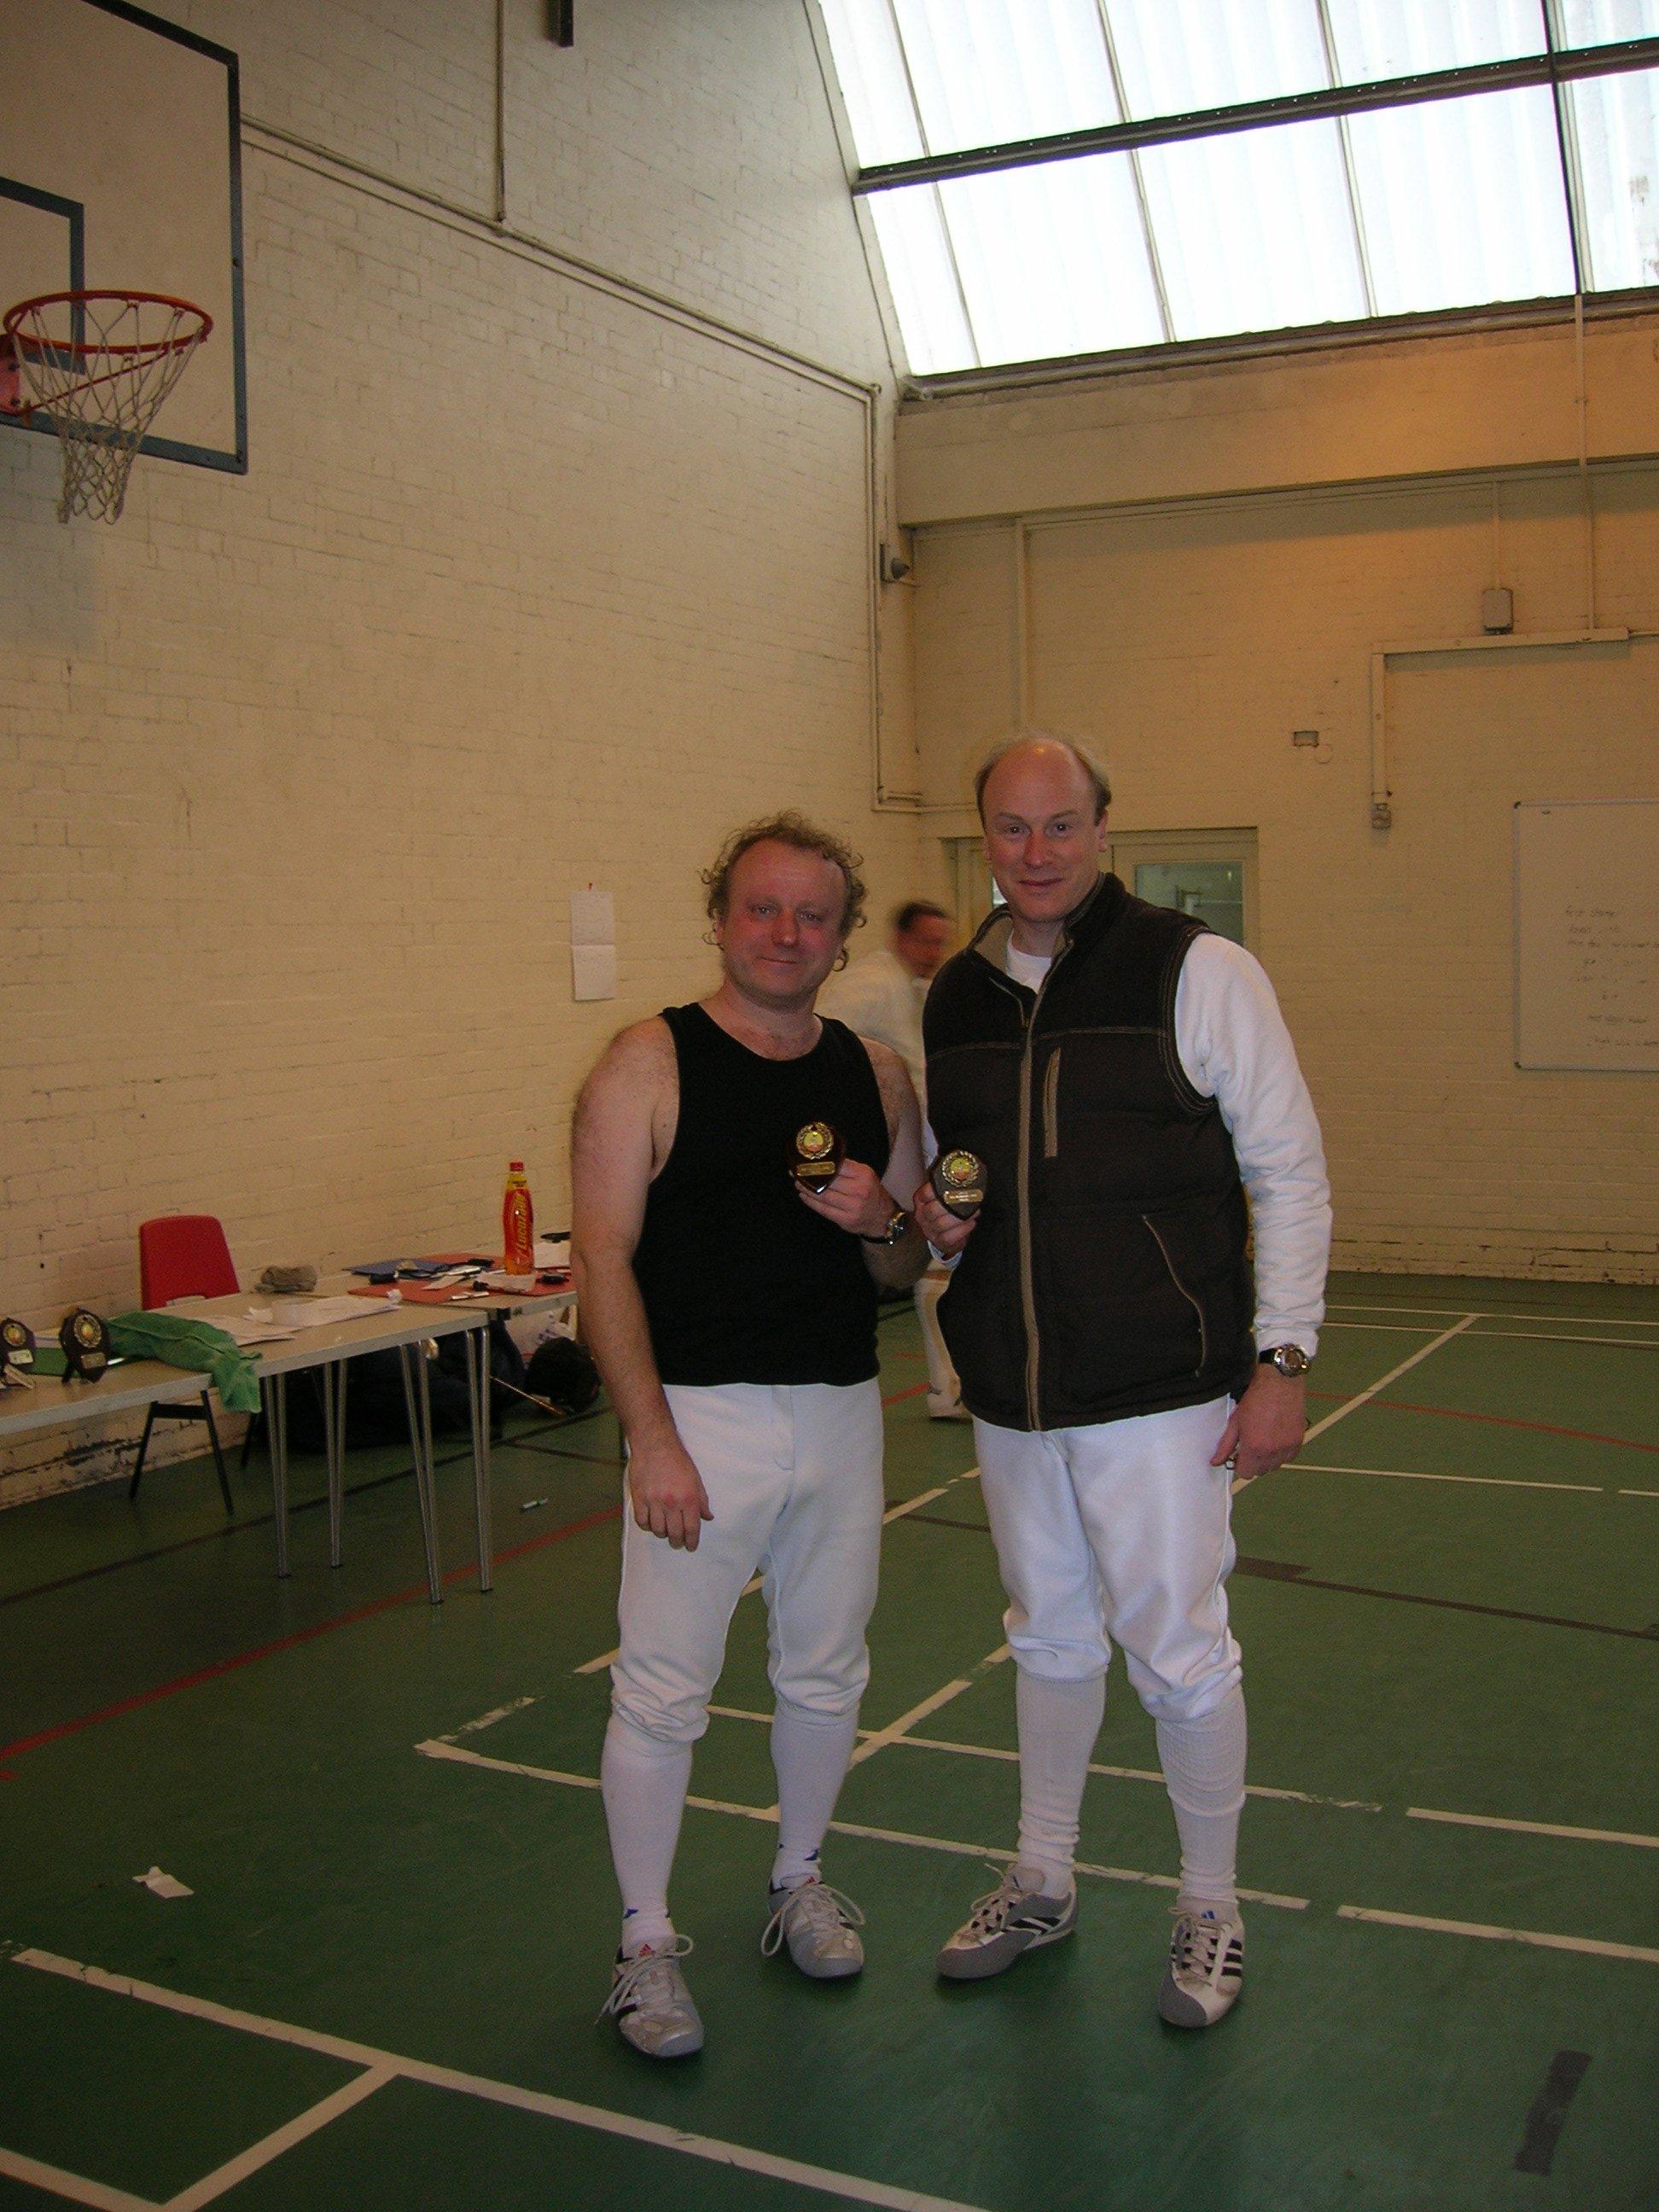 Richard and Roger